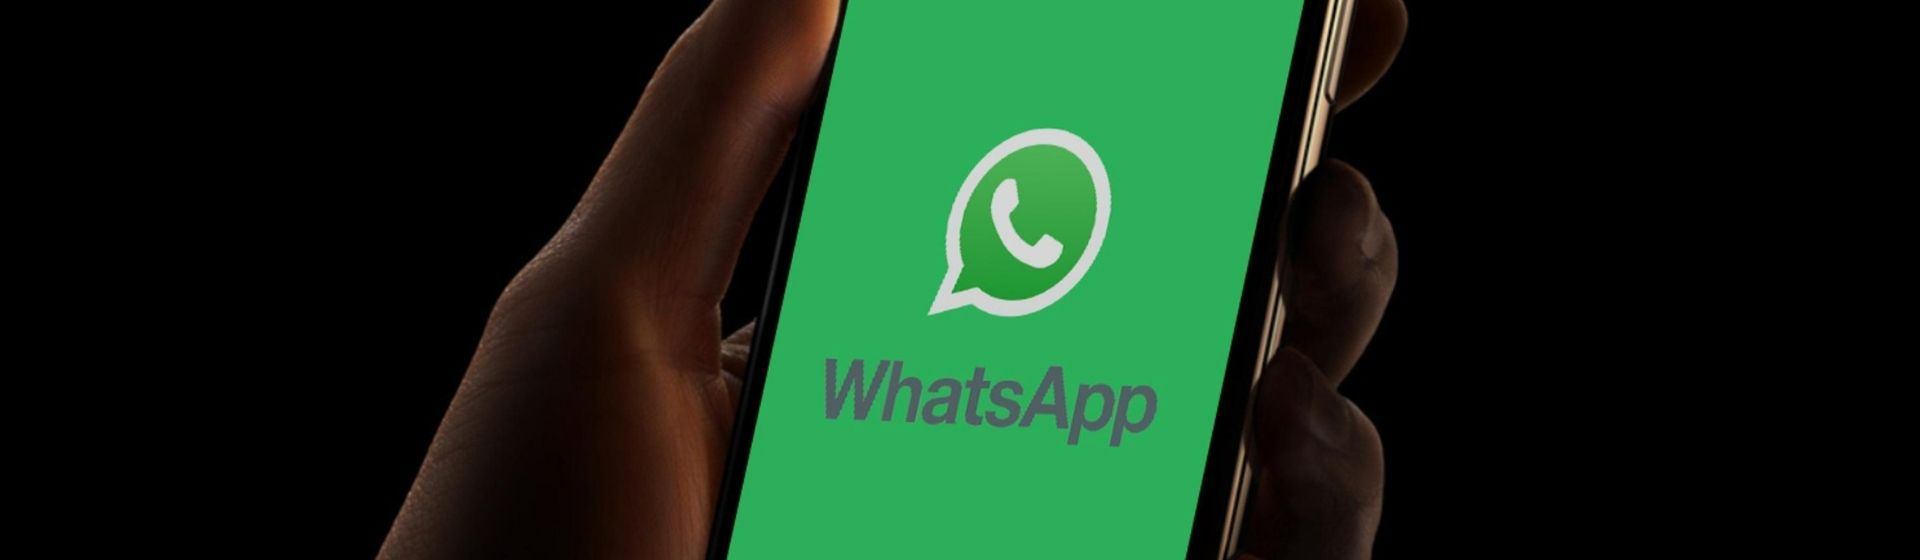 Como instalar o WhatsApp no celular